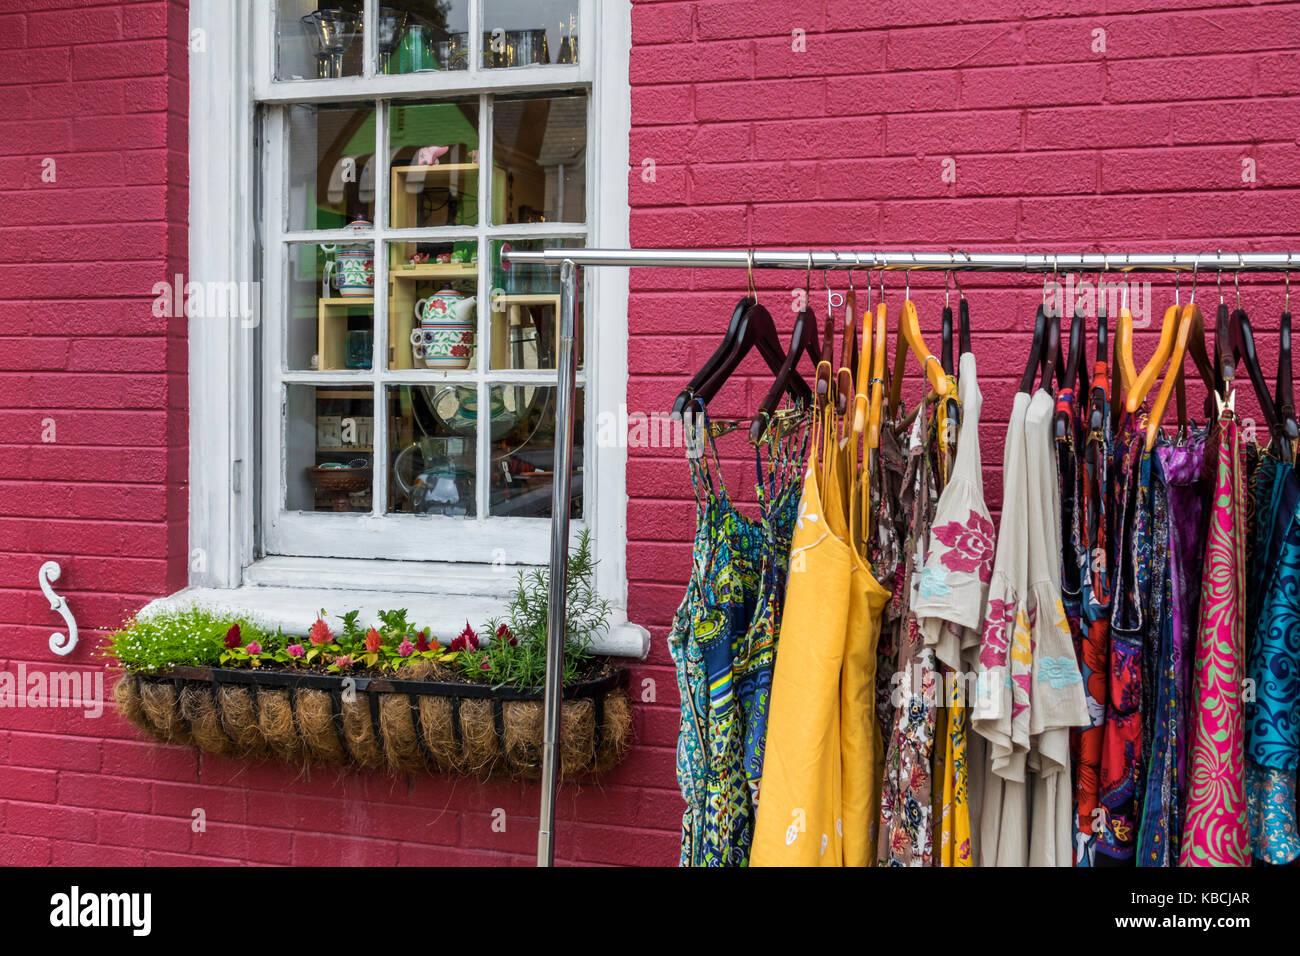 Richmond Virginia Carytown neighborhood urban retail district shopping store clothing rack sidewalk sale AlterNatives - Stock Image